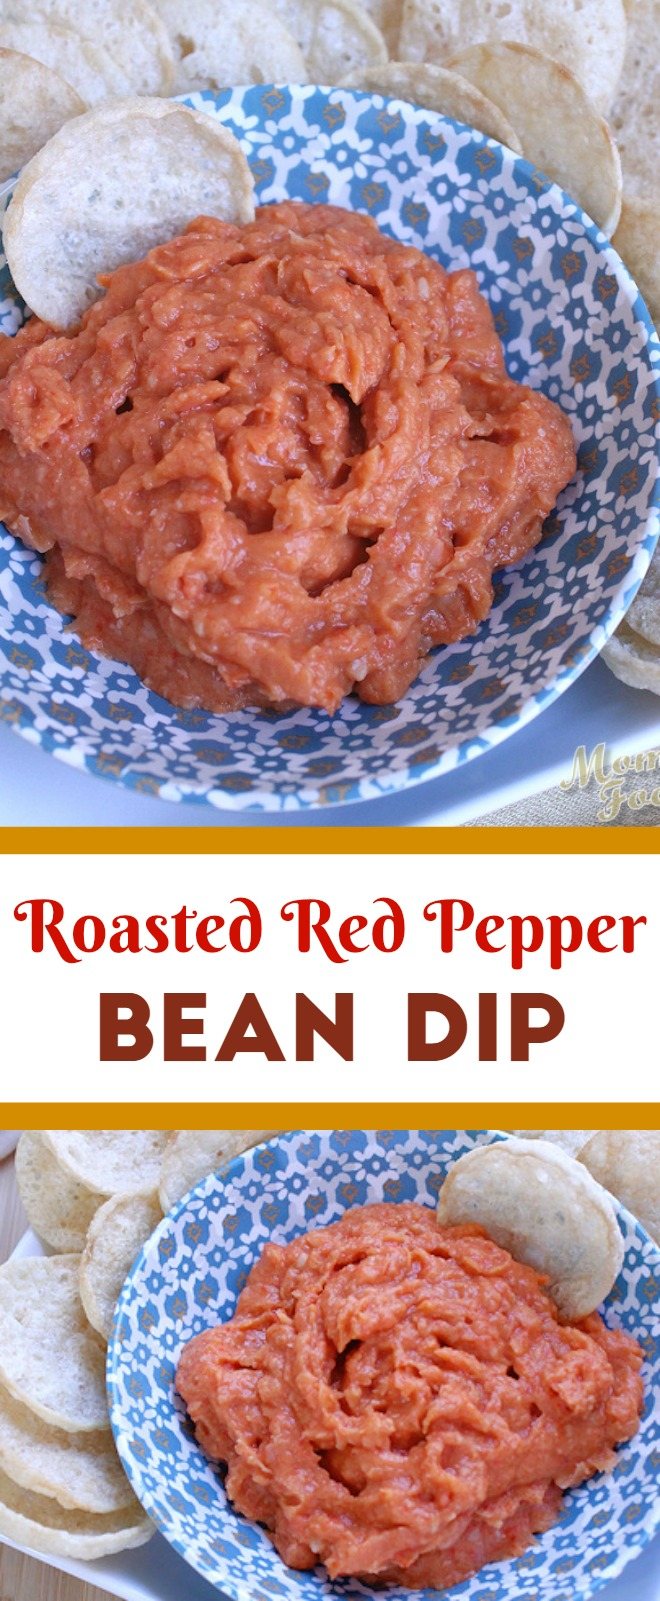 ... dip recipe you might like to try -> Artichoke & Sweet Onion Bean Dip